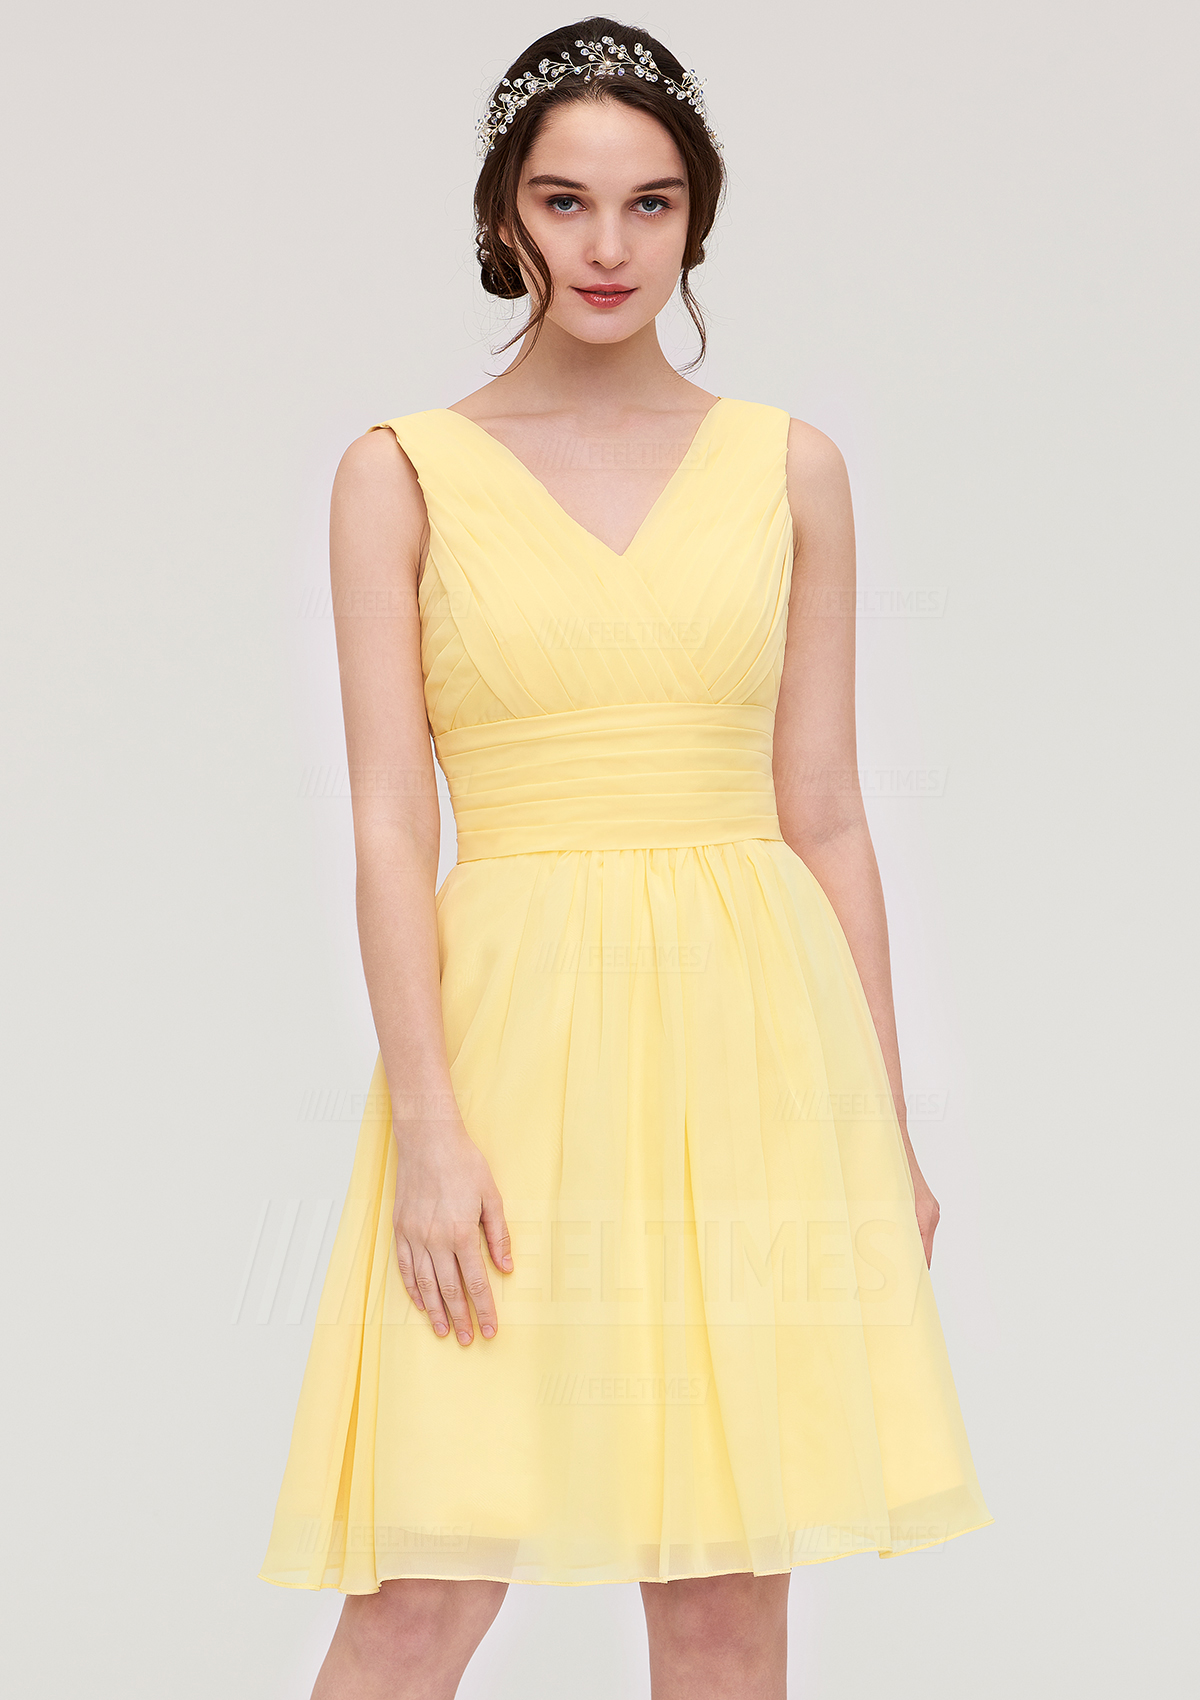 A-Line/Princess V Neck Sleeveless Knee-Length Chiffon Bridesmaid Dress With Pleated